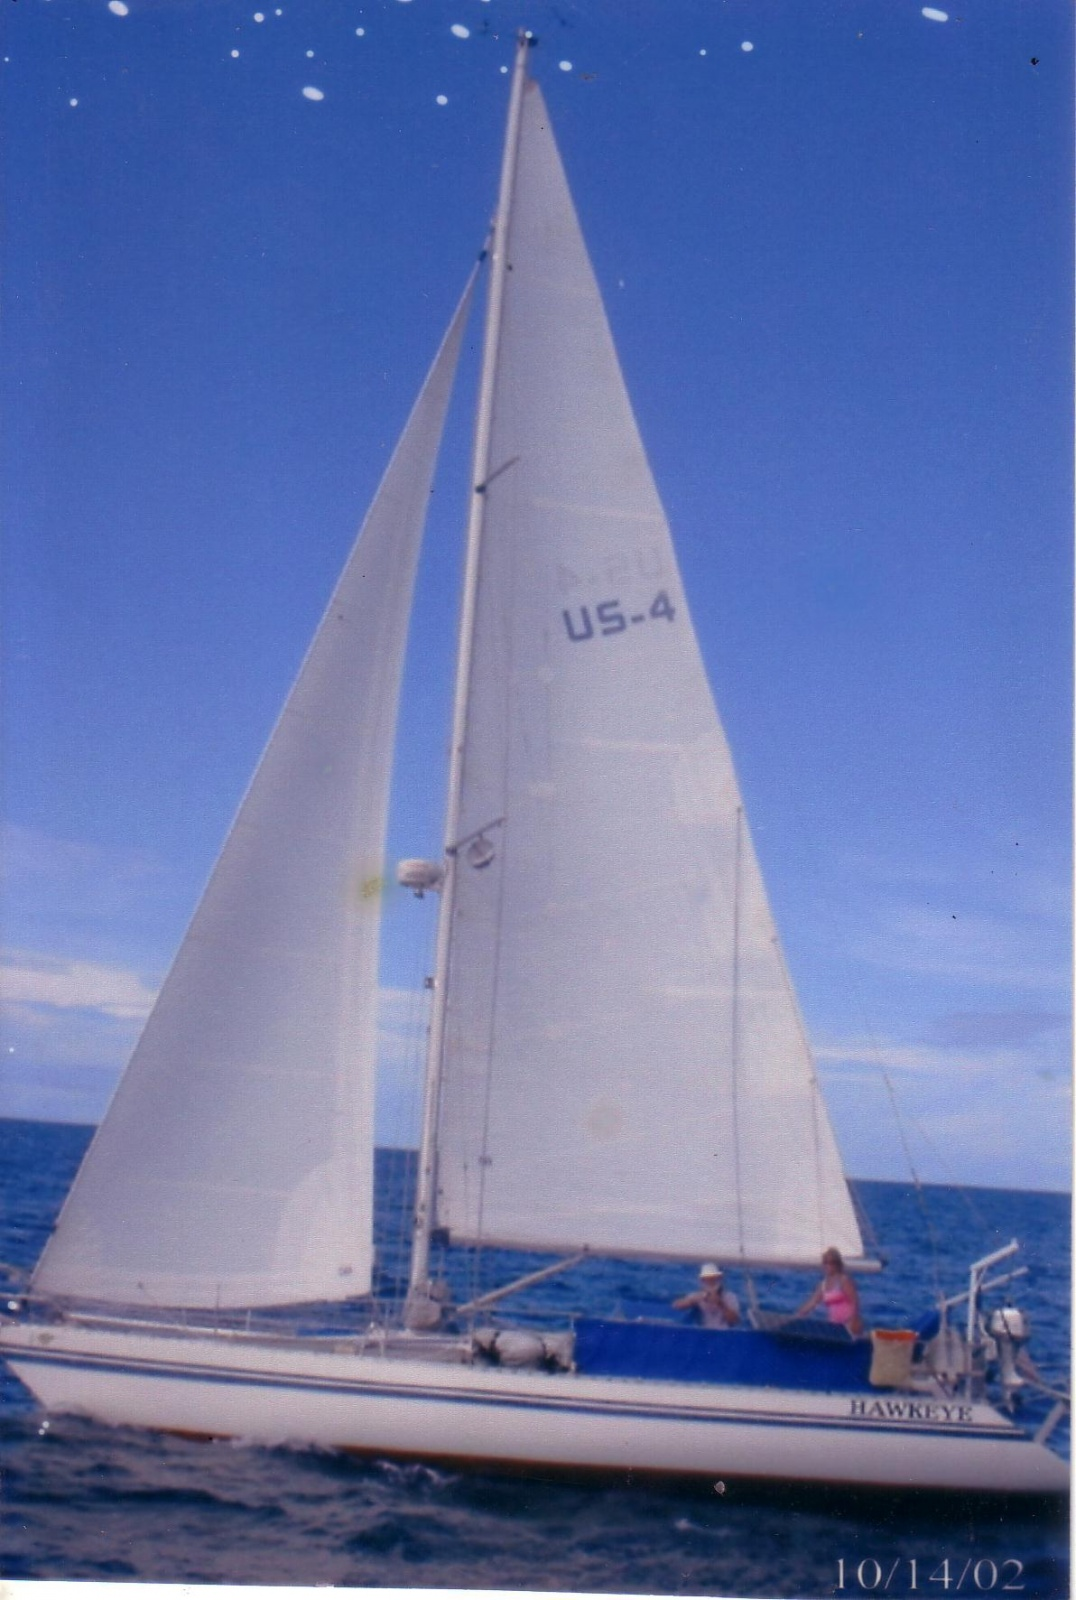 Click image for larger version  Name:Hawkeye sailing 1.jpg Views:211 Size:394.3 KB ID:163585